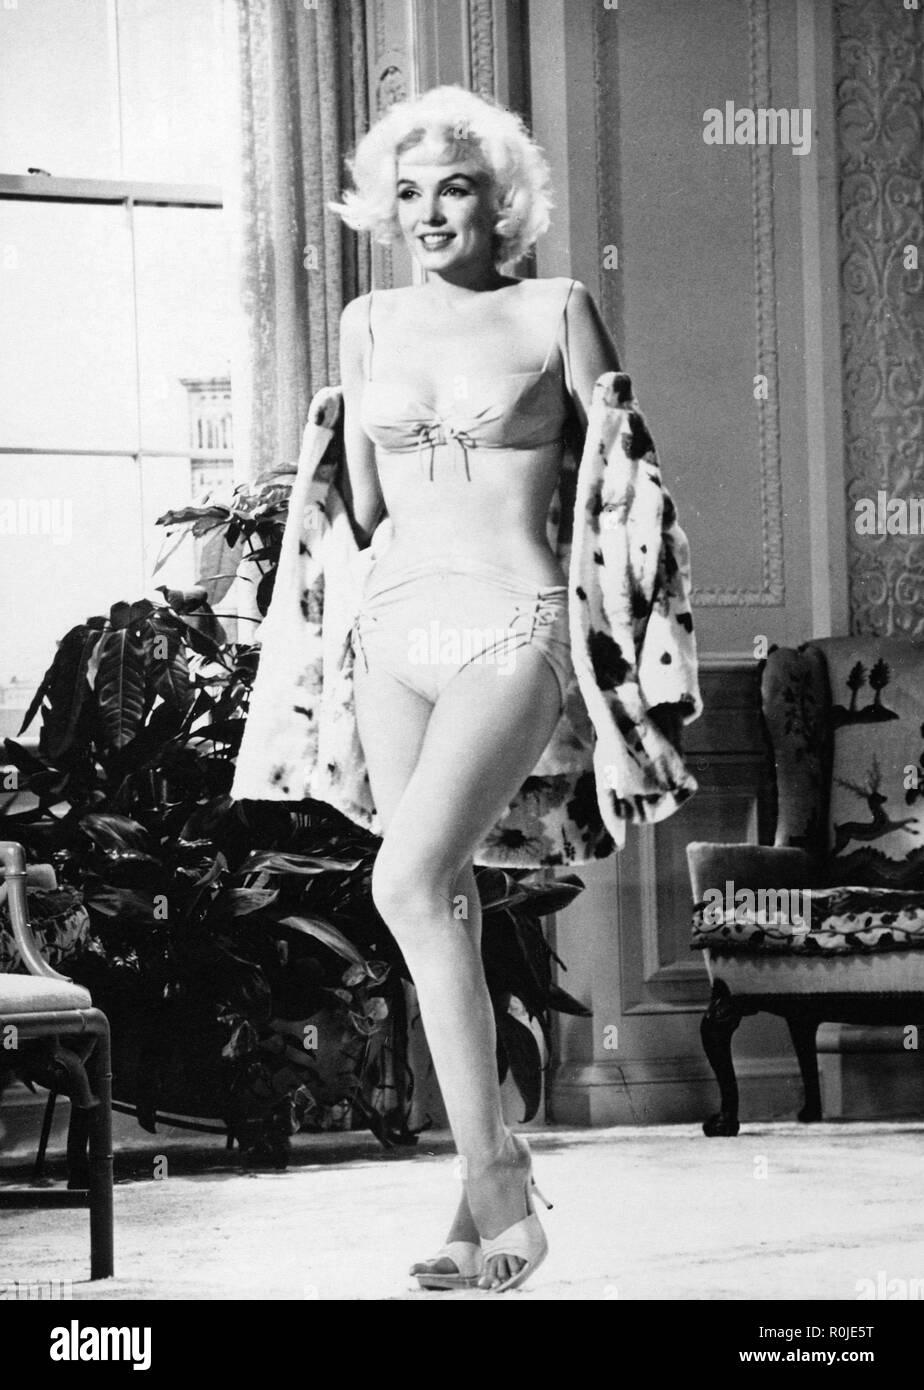 Marilyn Monroe Bikini High Resolution Stock Photography And Images Alamy